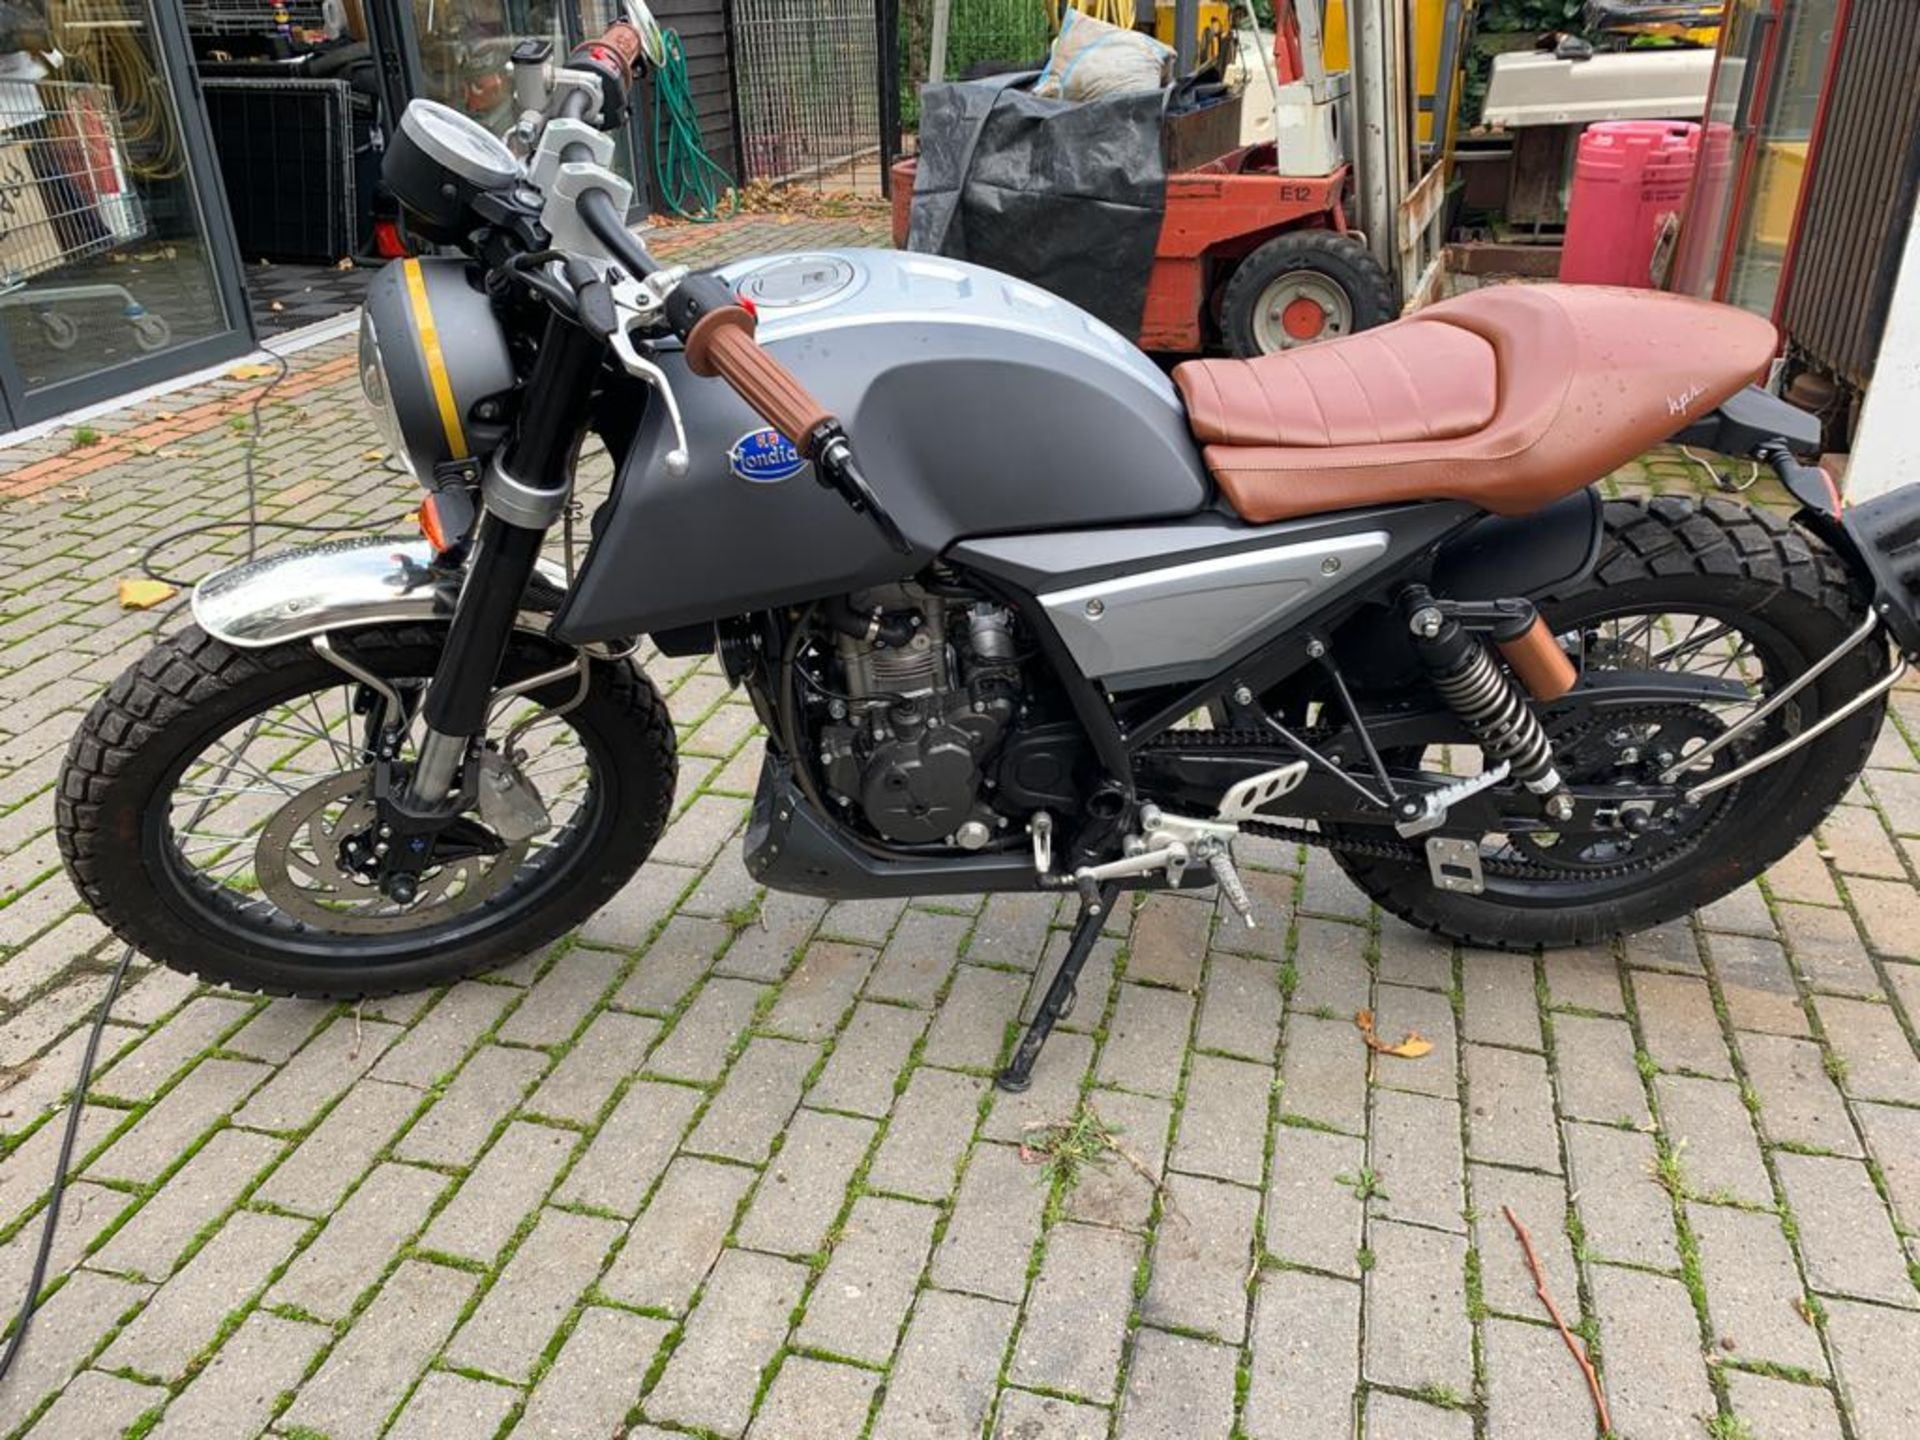 2018/18 REG MONDIAL HPS 125 S E4 SCRAMBLER MOTORBIKE / MOTORCYCLE, ROAD REGISTERED WITH V5 PRESENT - Image 2 of 11